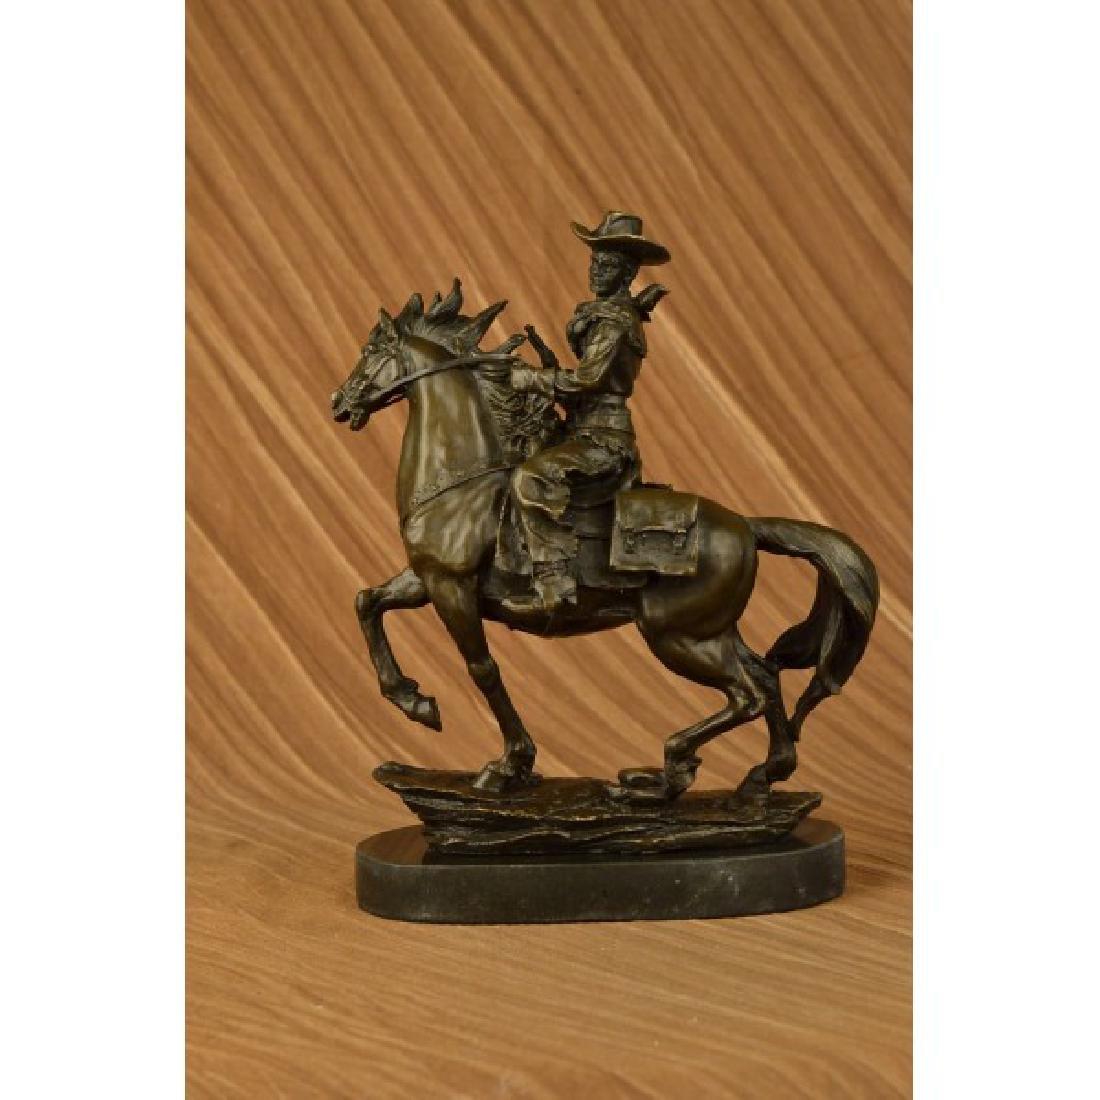 Western Cowboy Horse Bronze Sculpture on Marble Base